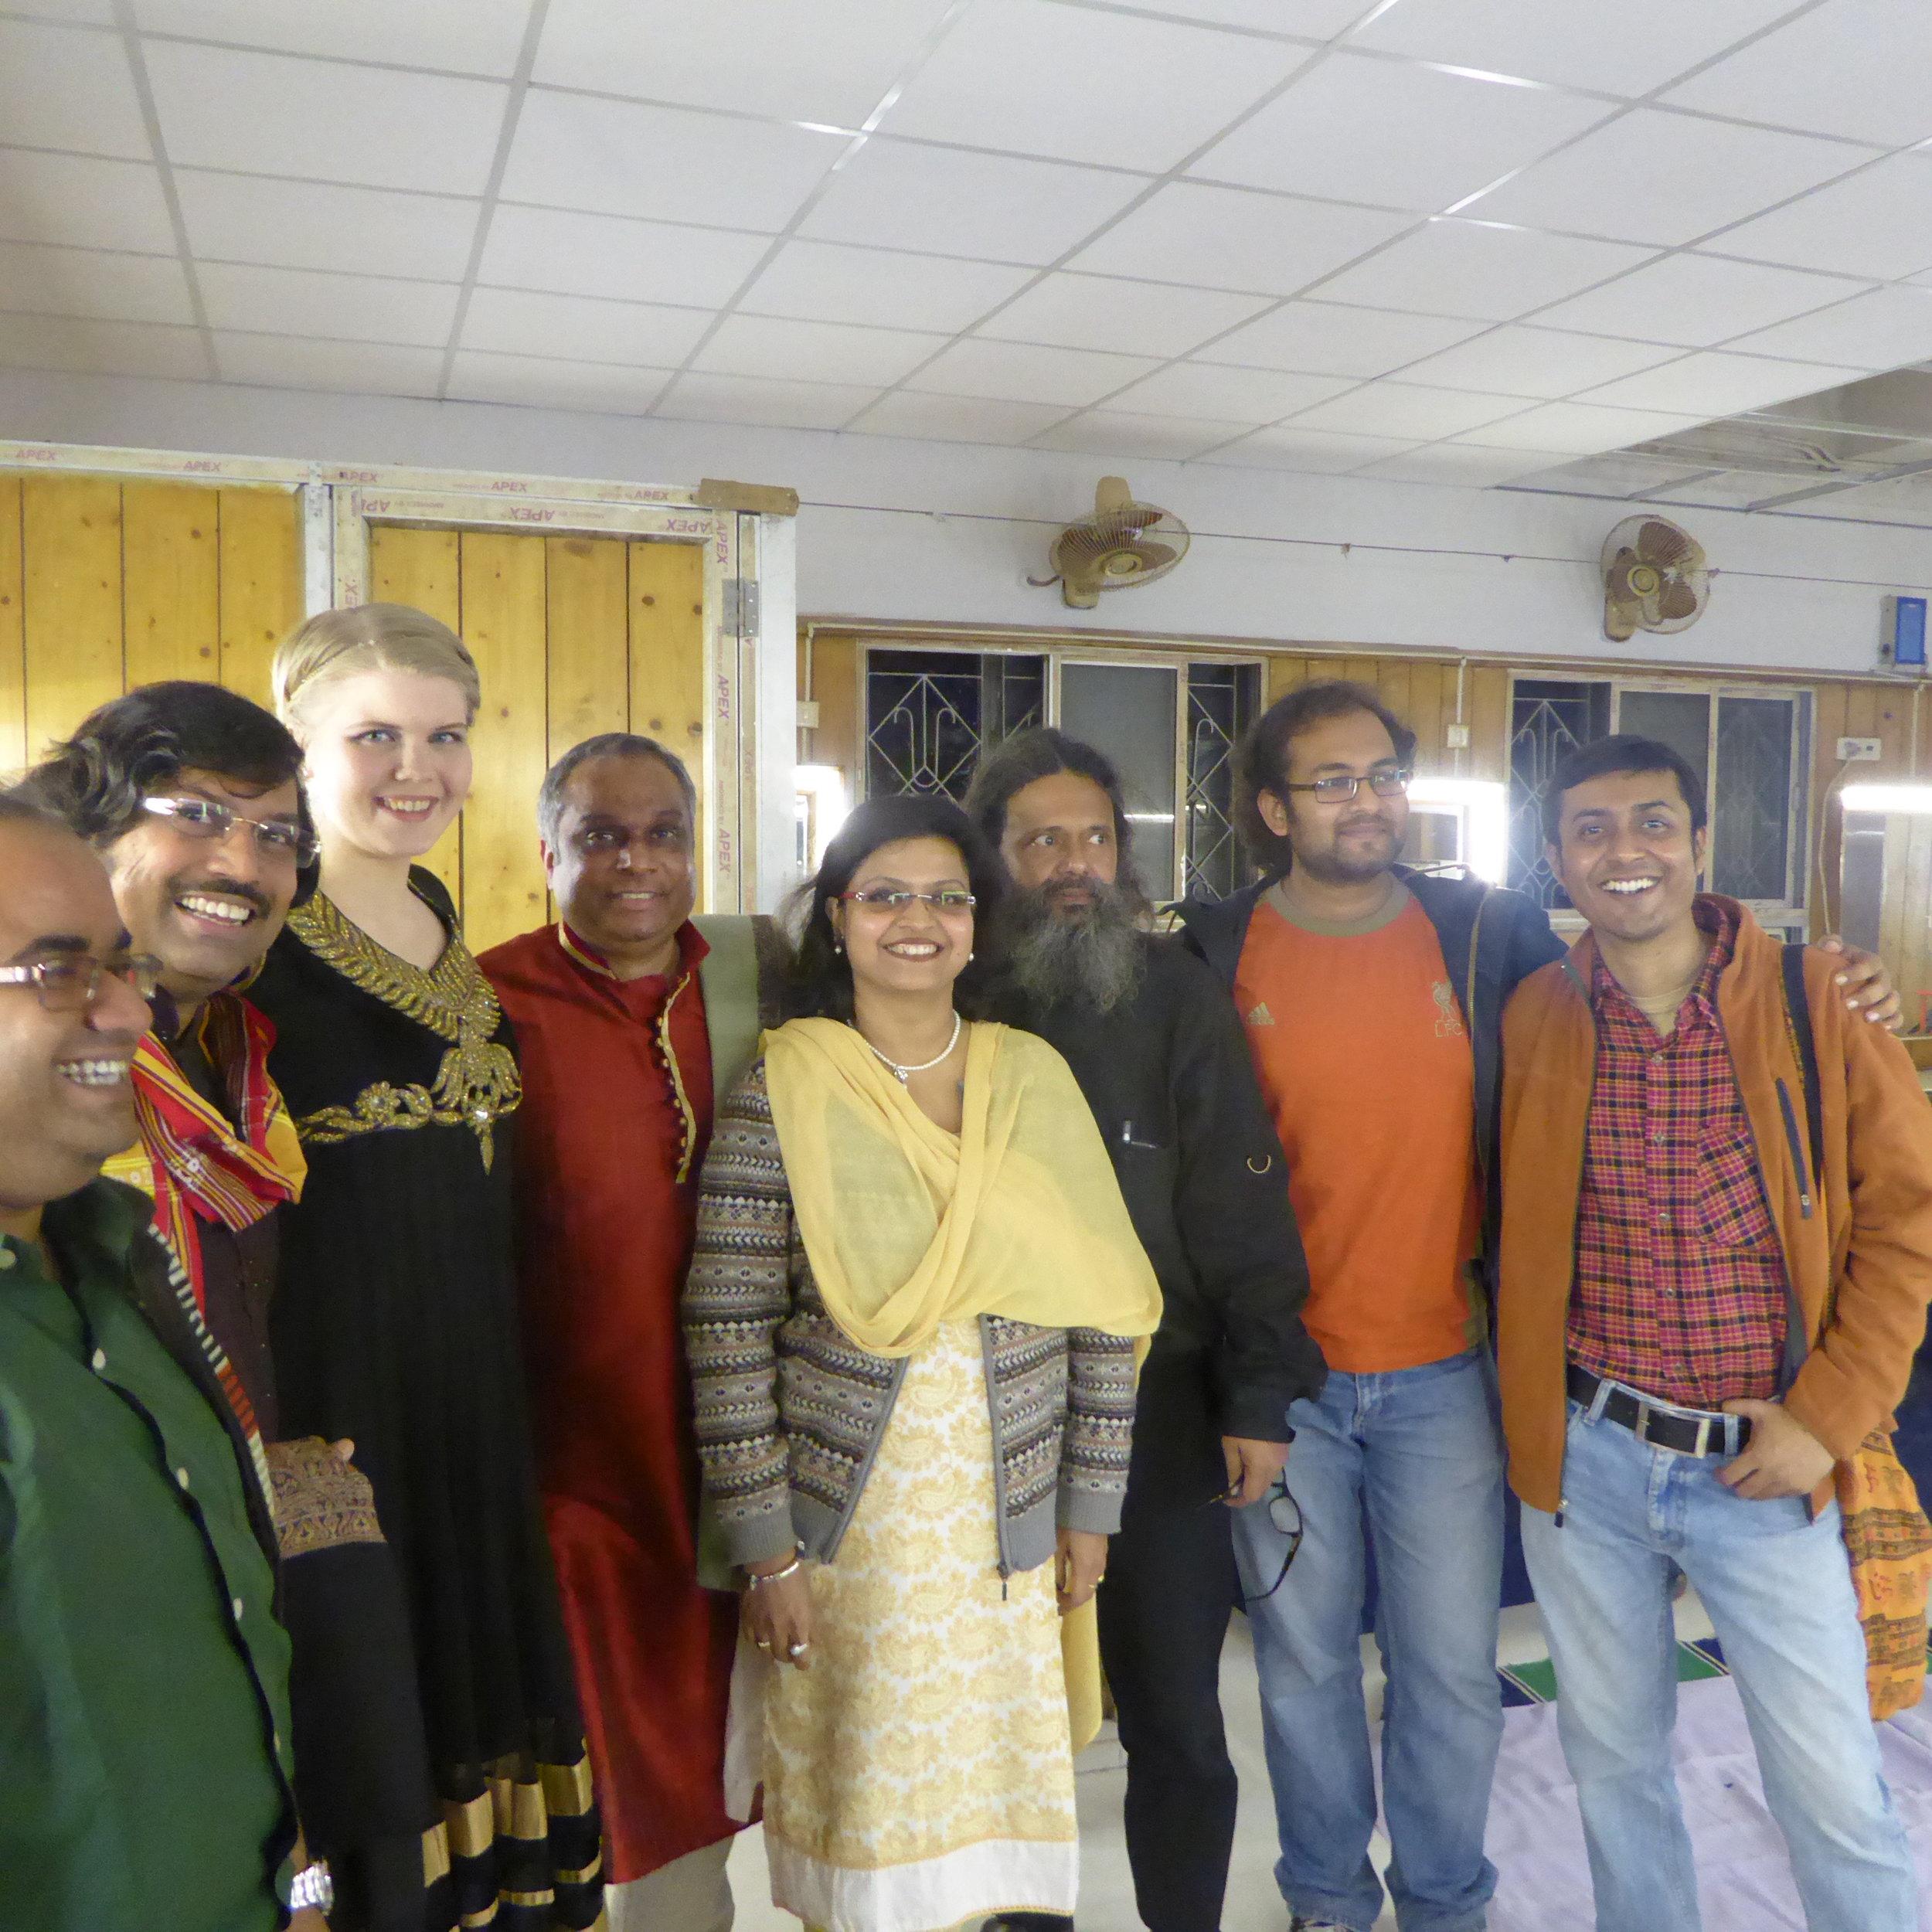 Amit Chatterjee, me, Ashraf, Amit's wife, Prosanta Kumar, Abhirup Roy, Apratim Majumdar